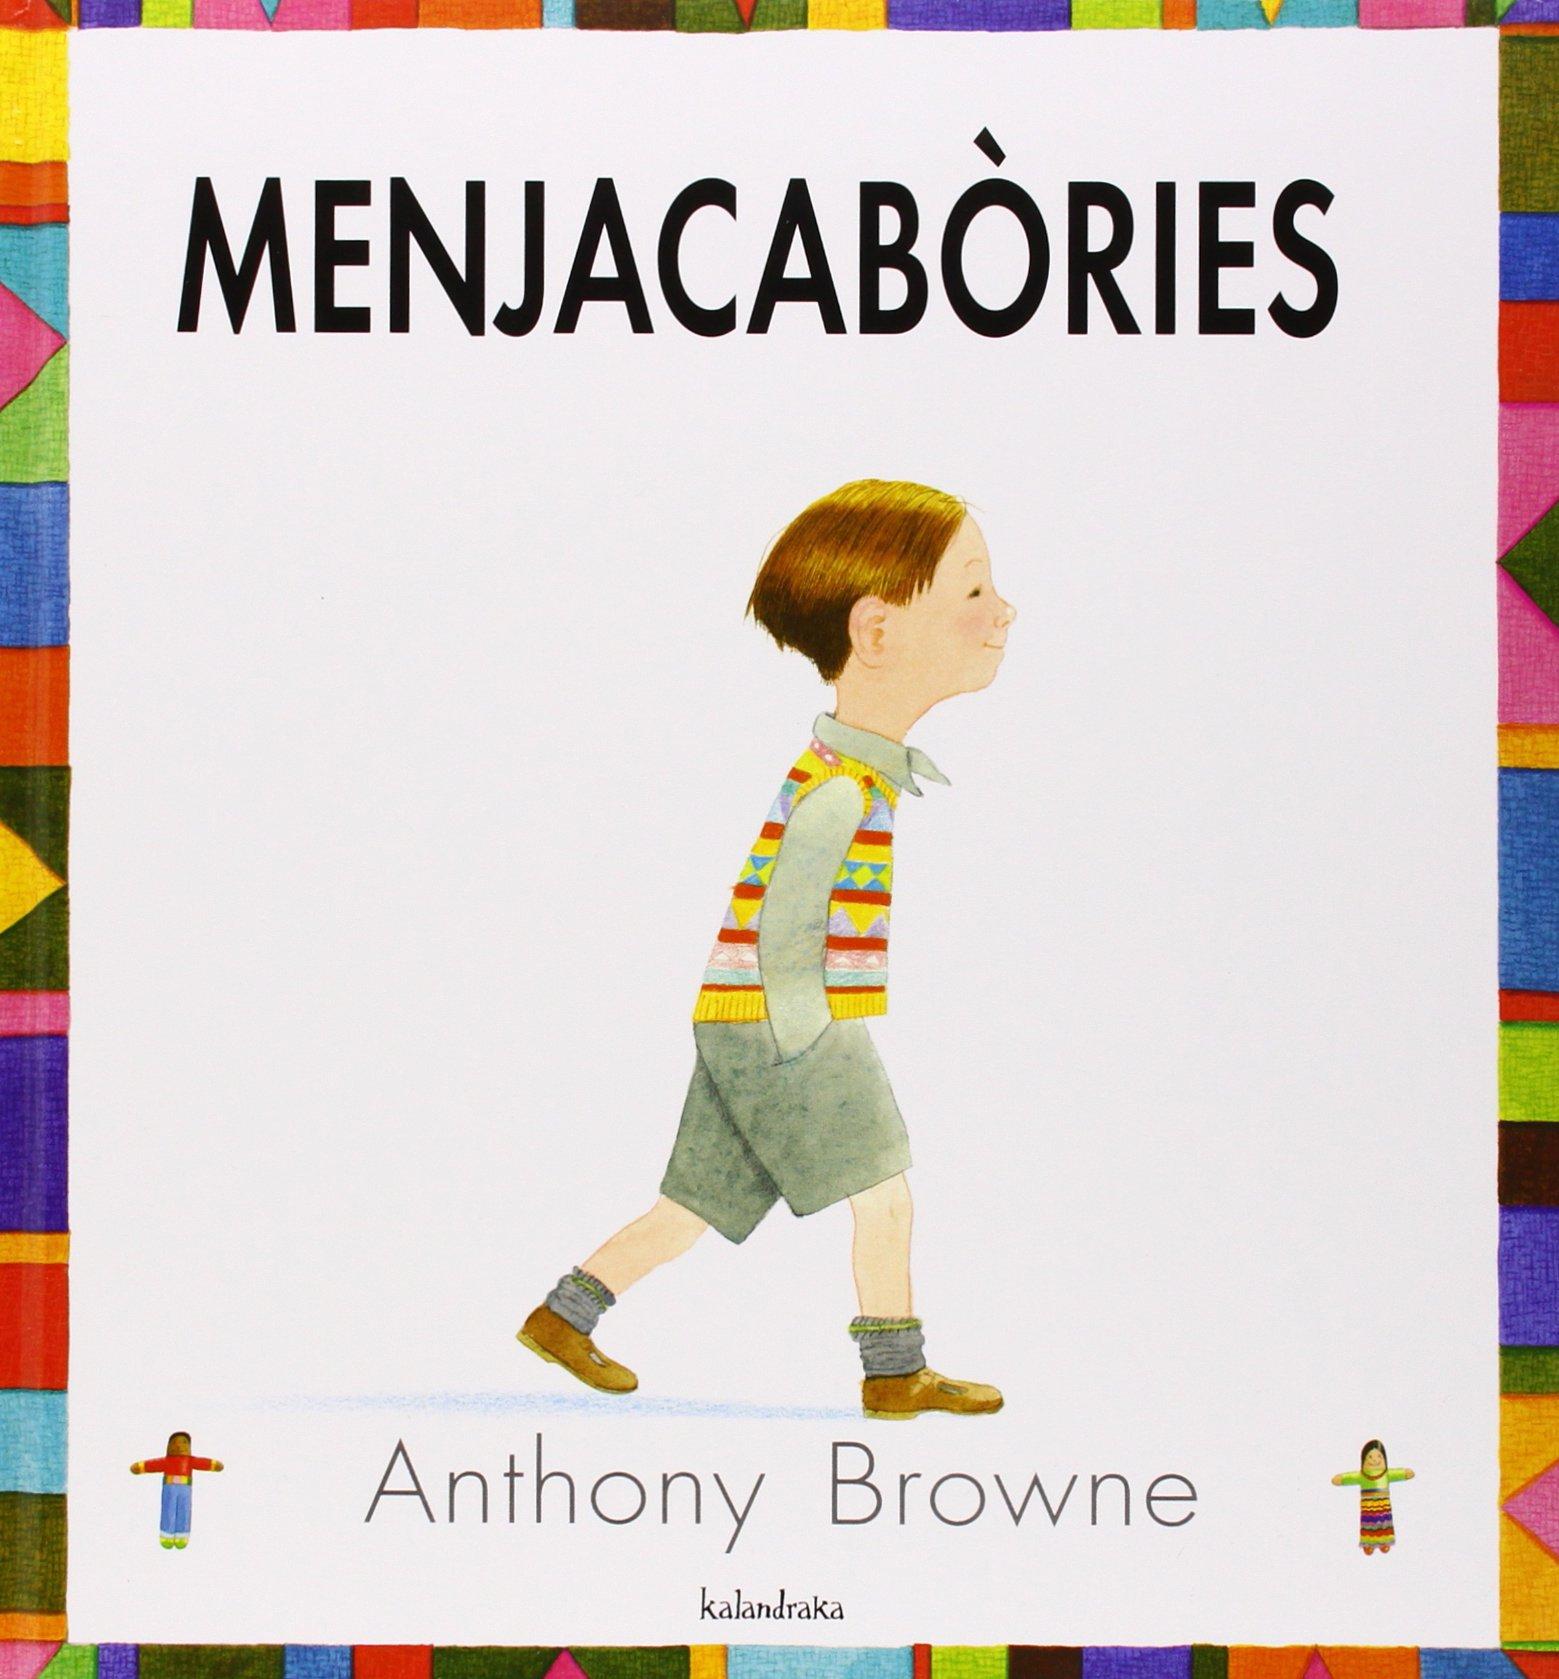 Menjacabòries (Llibres per a somniar): Amazon.es: Browne, Anthony, Browne,  Anthony: Libros